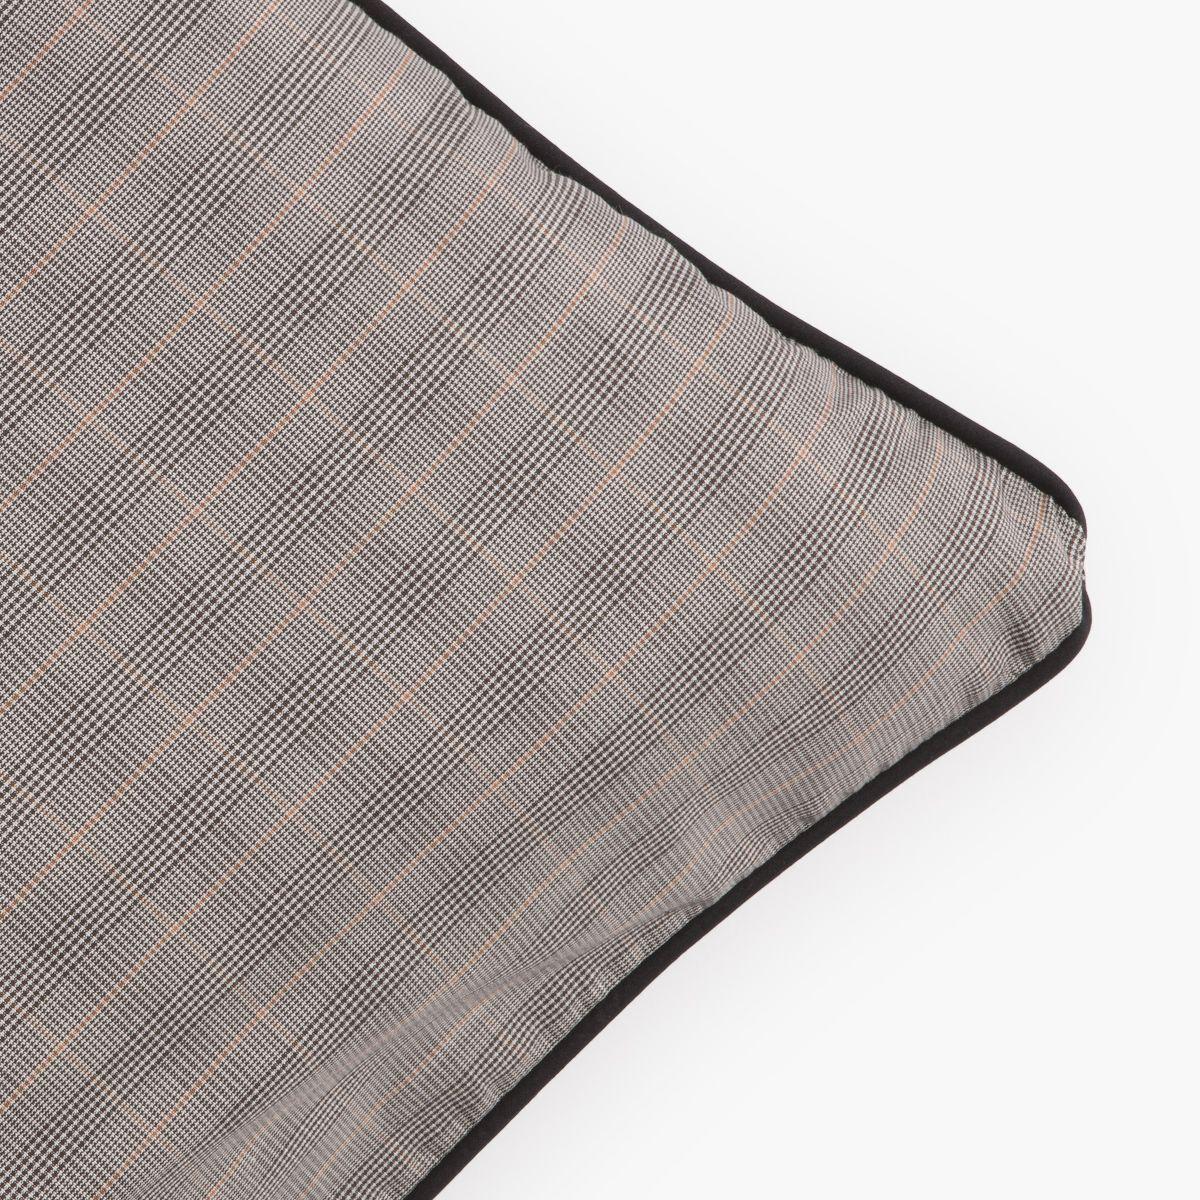 Cojín de algodón gris. Grey cotton cushion.